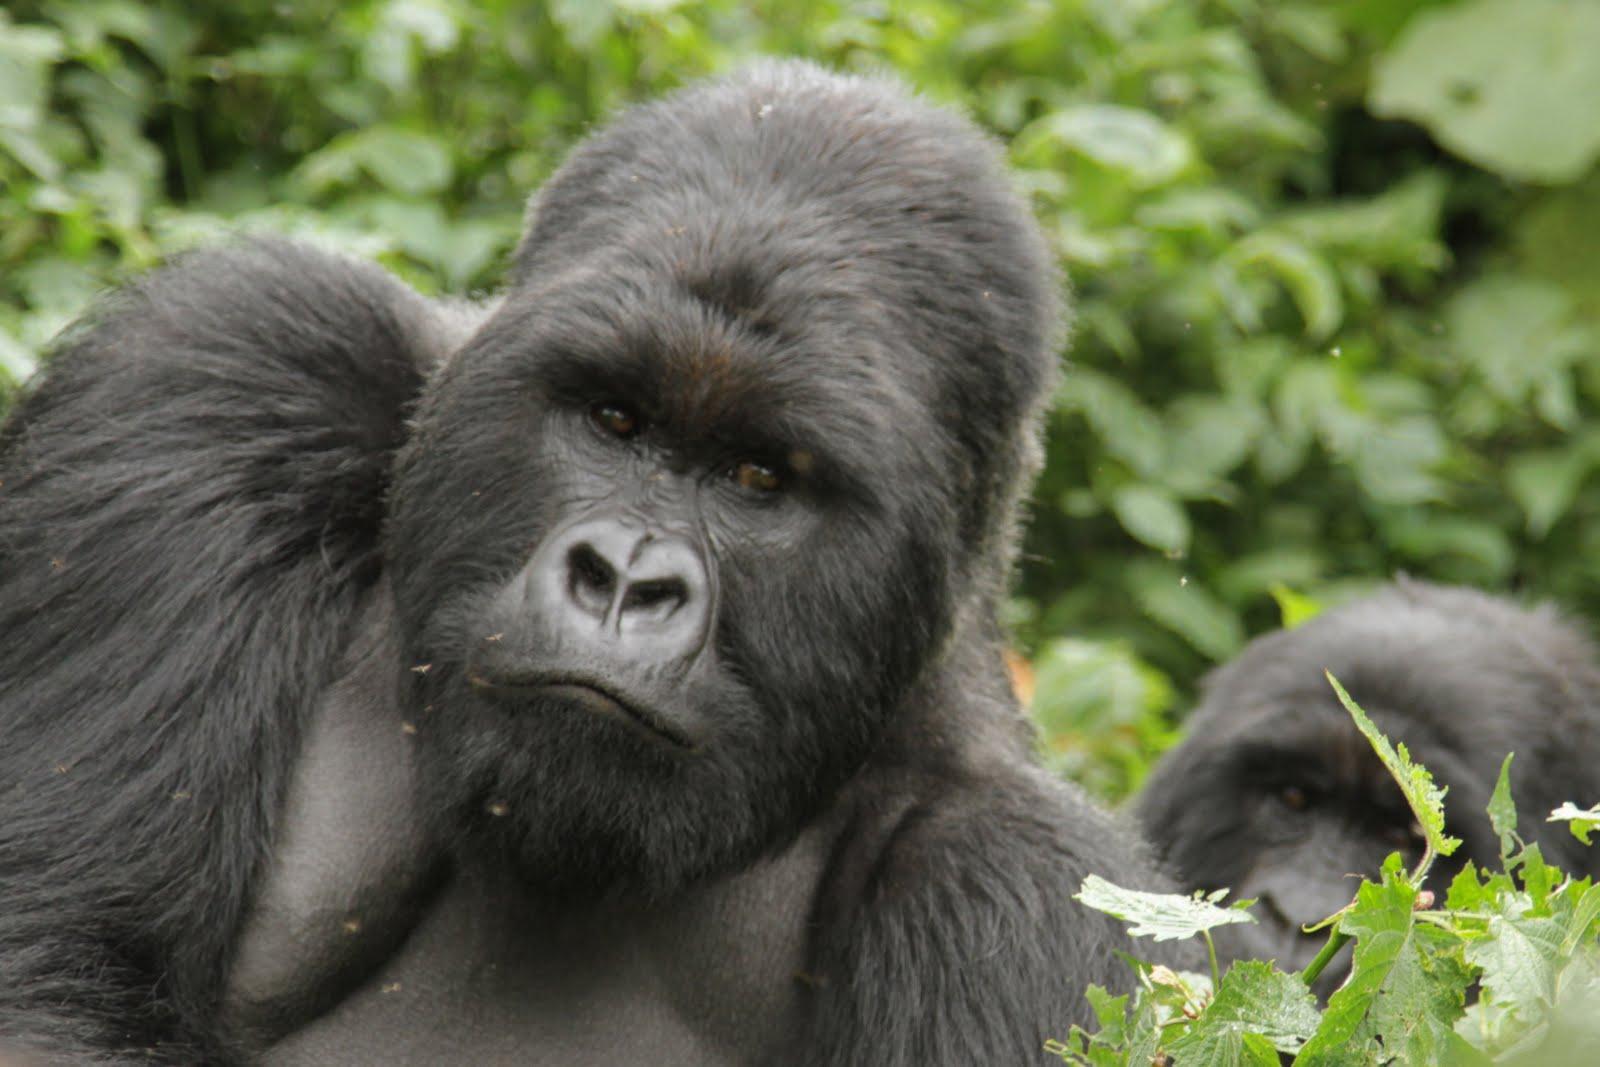 Molecular Anthropology: Gorilla Trekking Experience